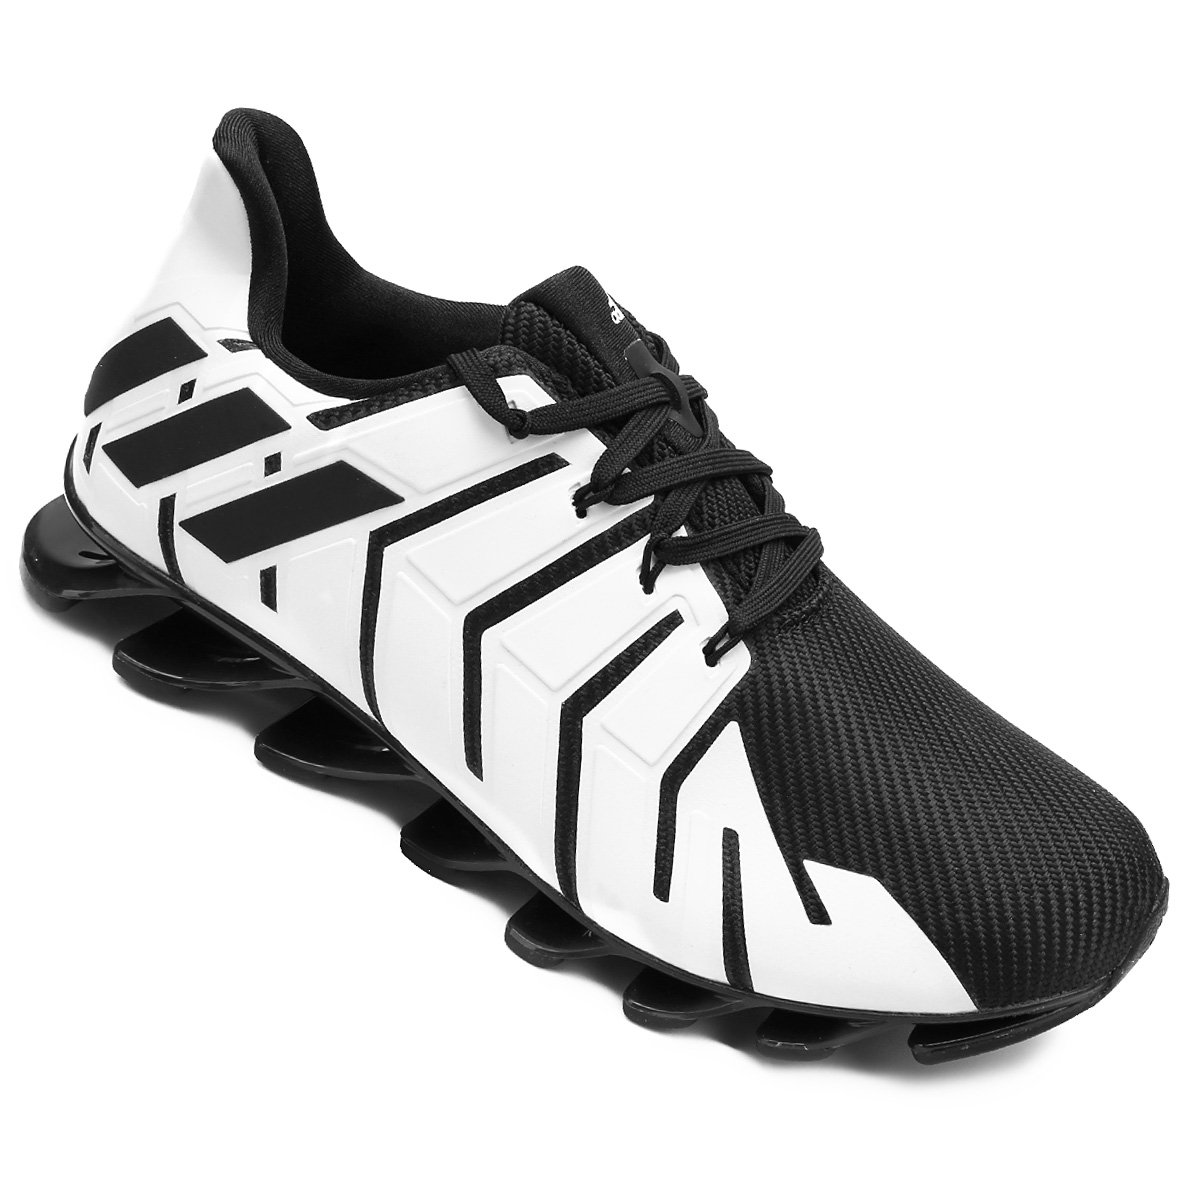 pretty nice 63307 47366 ... shopping tênis adidas springblade pro masculino branco e preto b8e08  87cd6